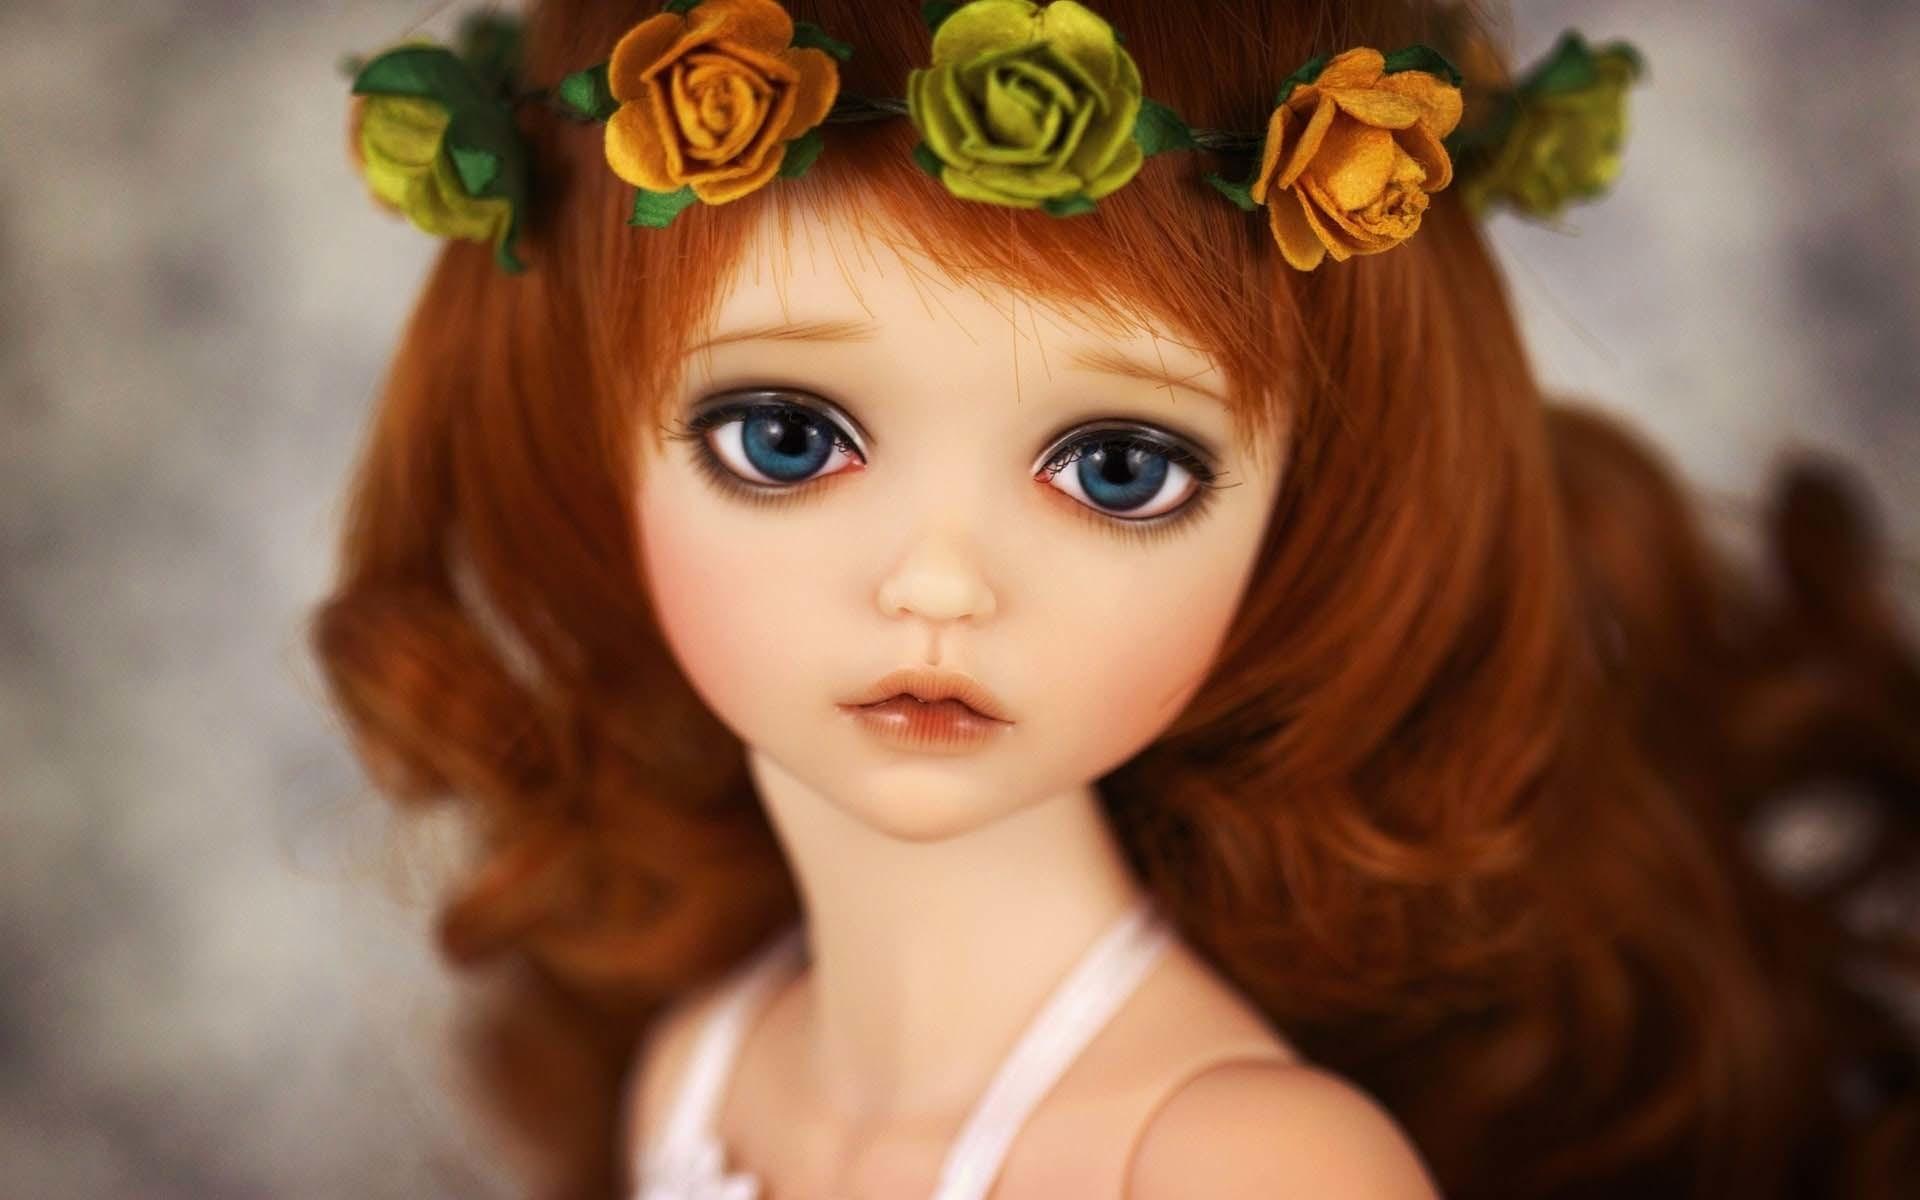 Barbie Doll Wallpaper Free Download